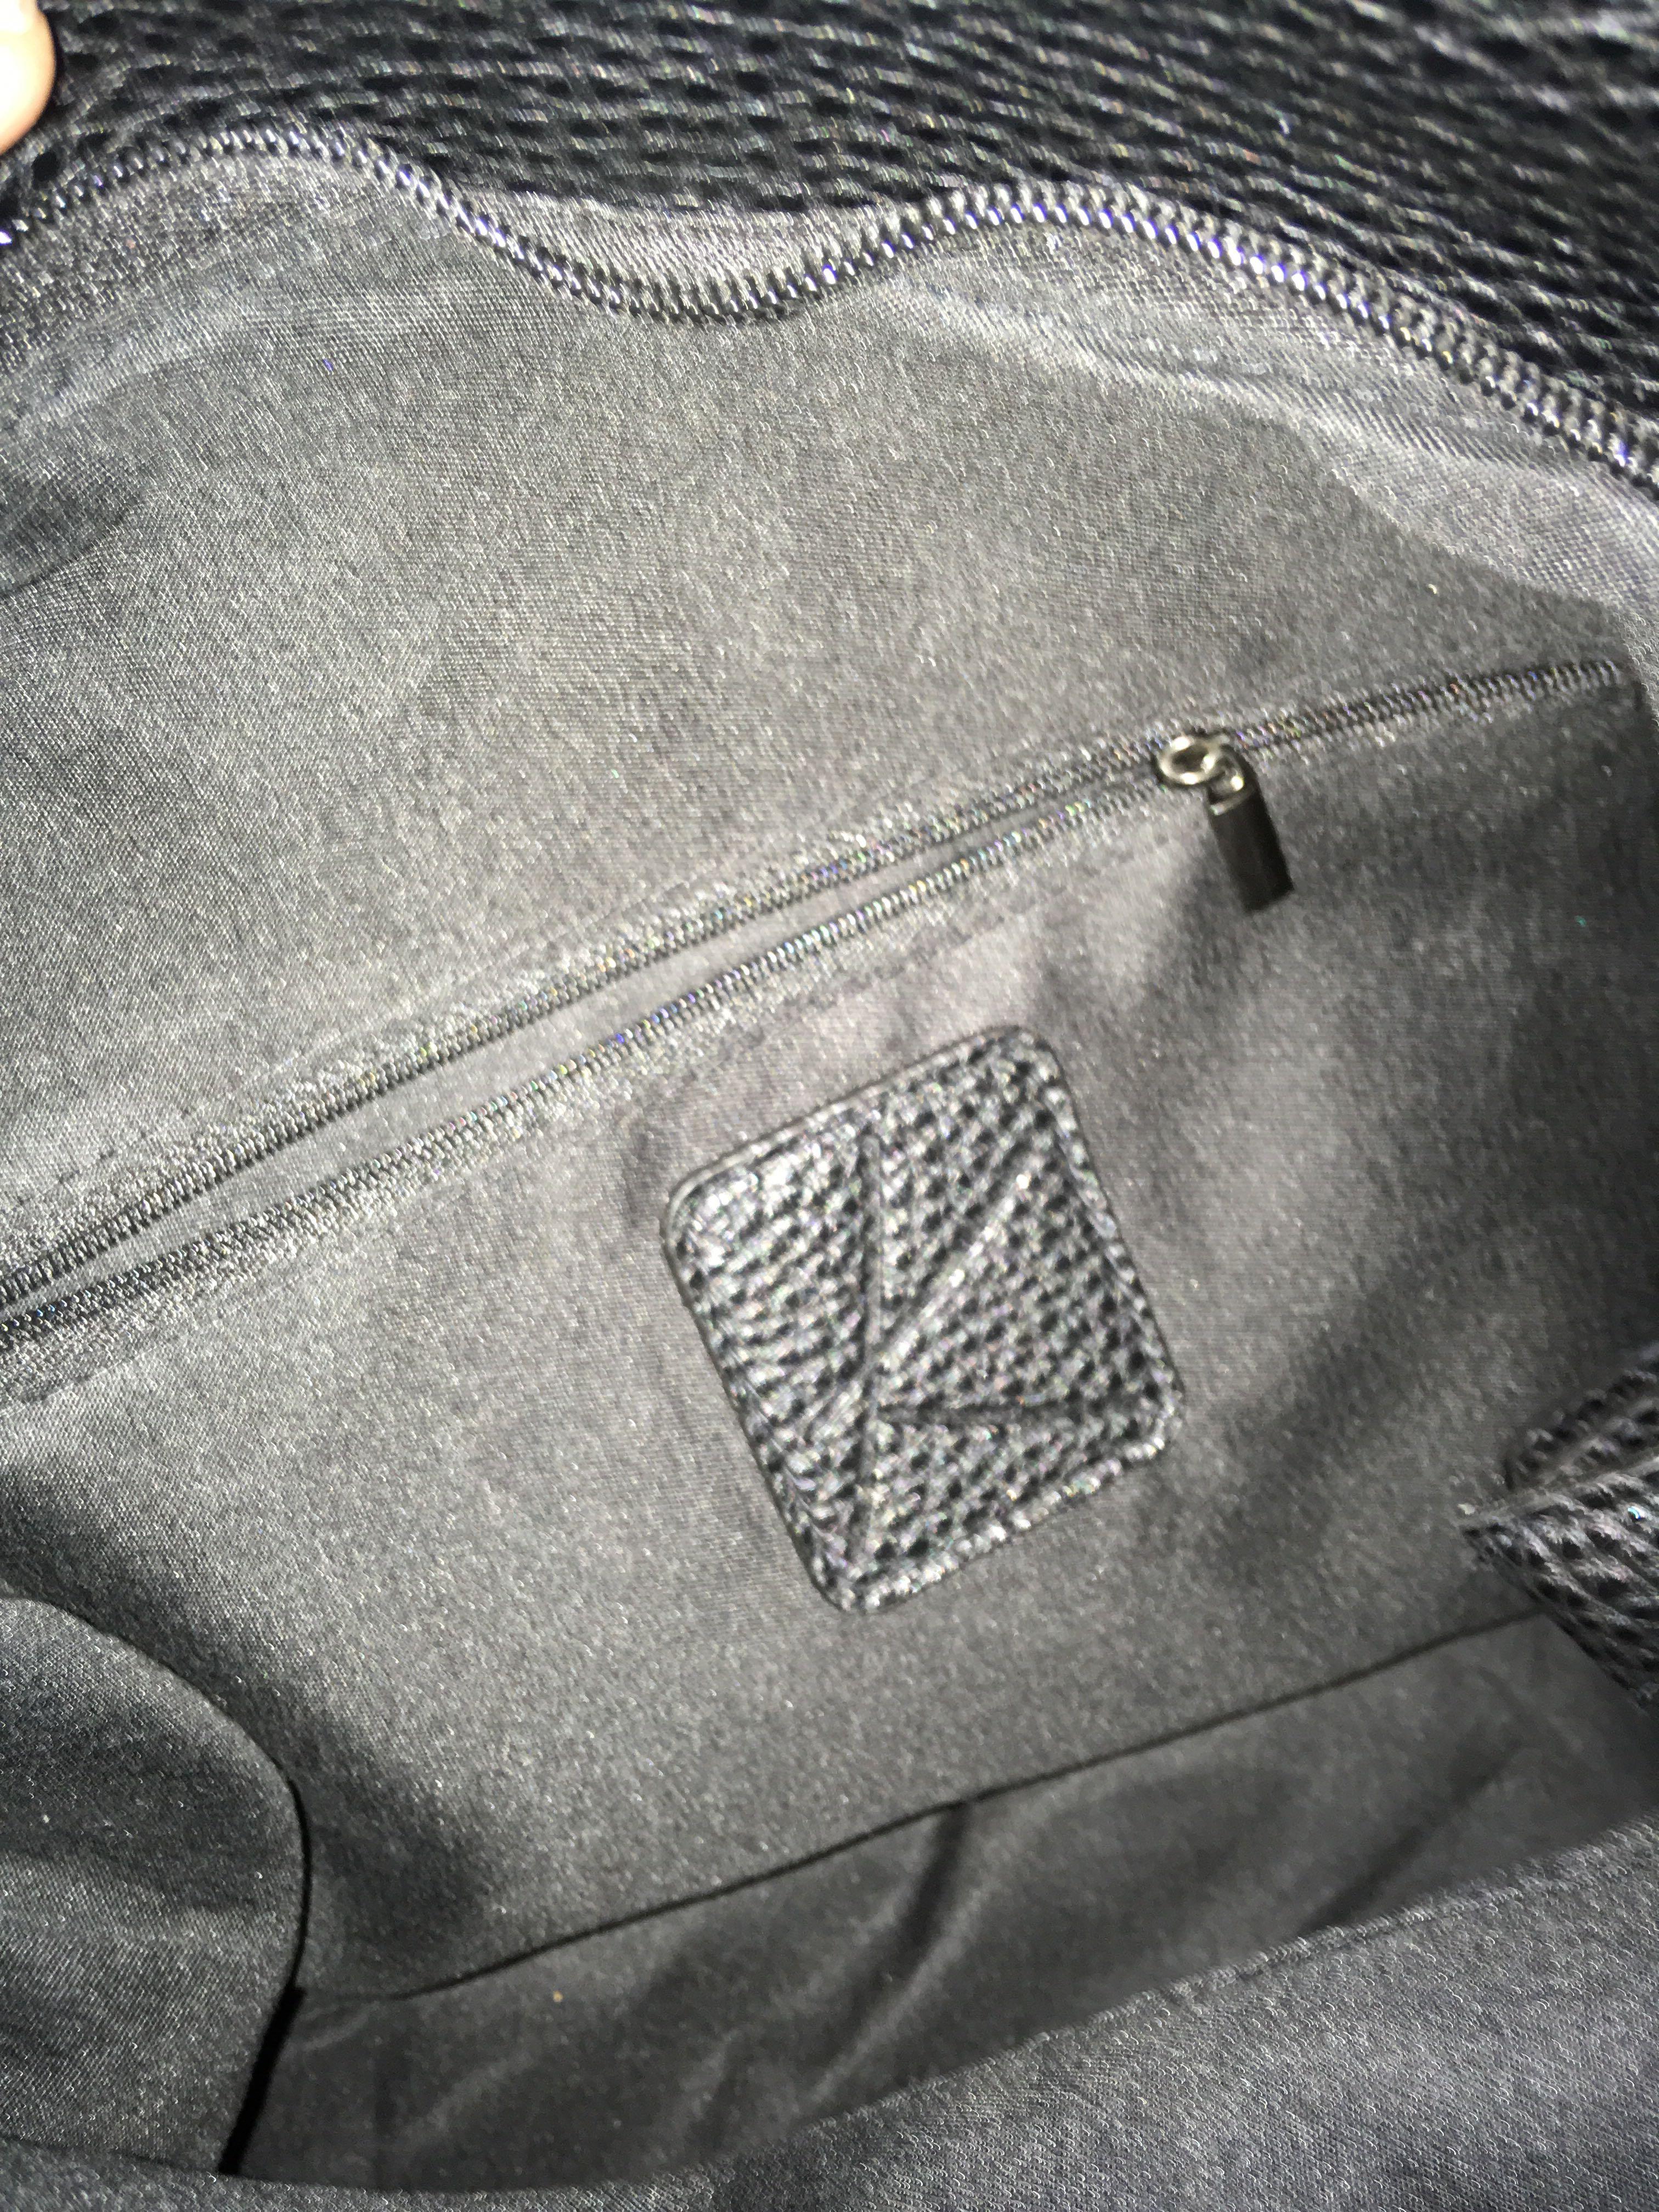 BNWOT Extra large black tote bag